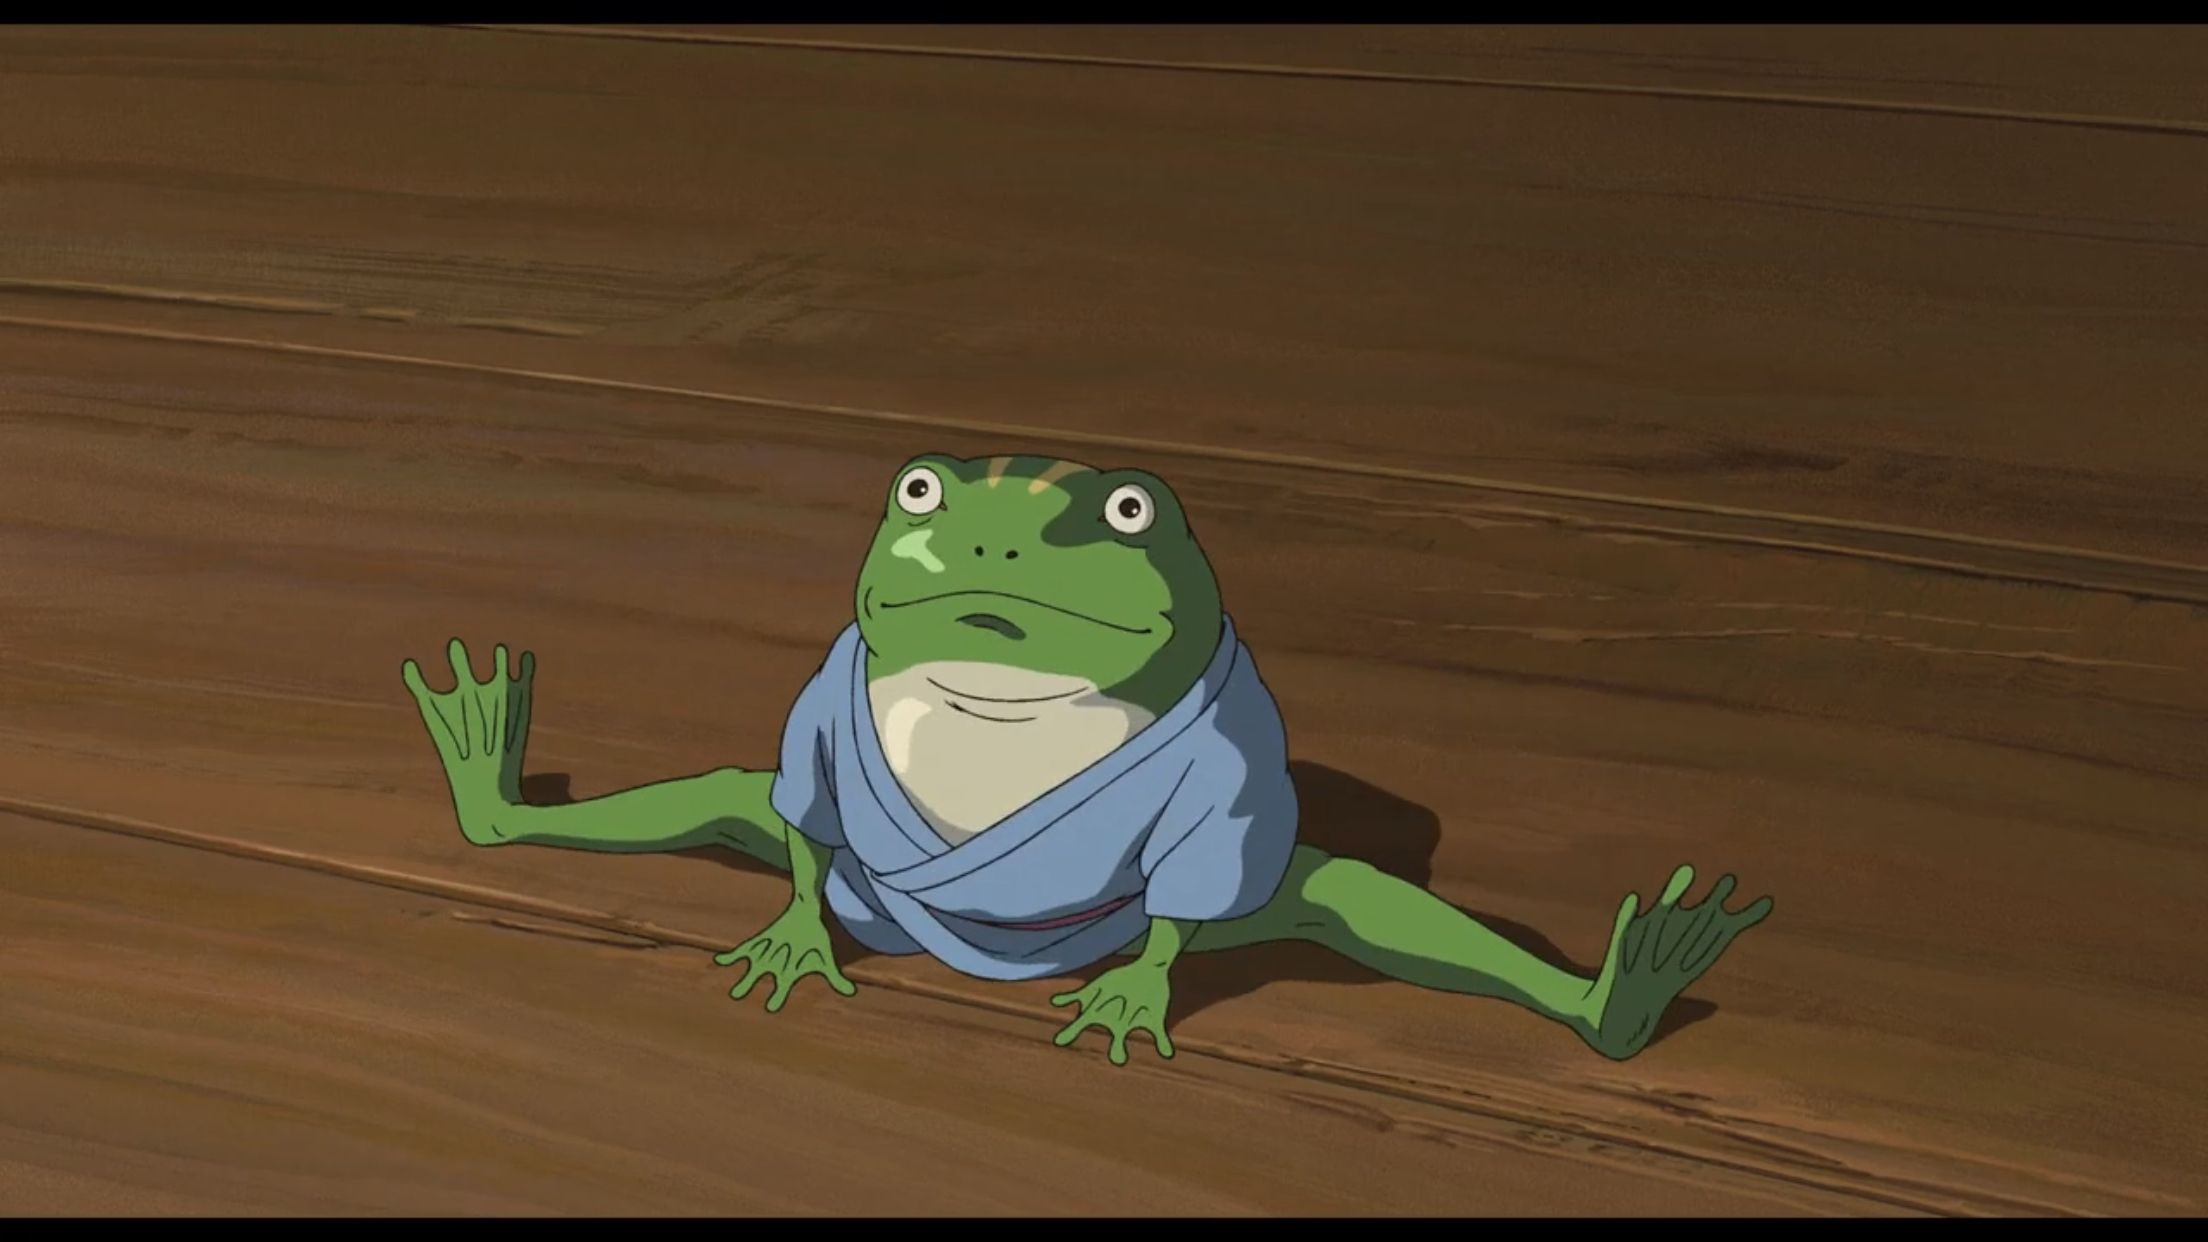 𝐏𝐢𝐧𝐭𝐞𝐫𝐞𝐬𝐭 𝐂𝐡𝐢𝐬𝐬𝐂𝐚𝐤𝐞𝐞 Cute Frogs Studio Ghibli Art Frog Art